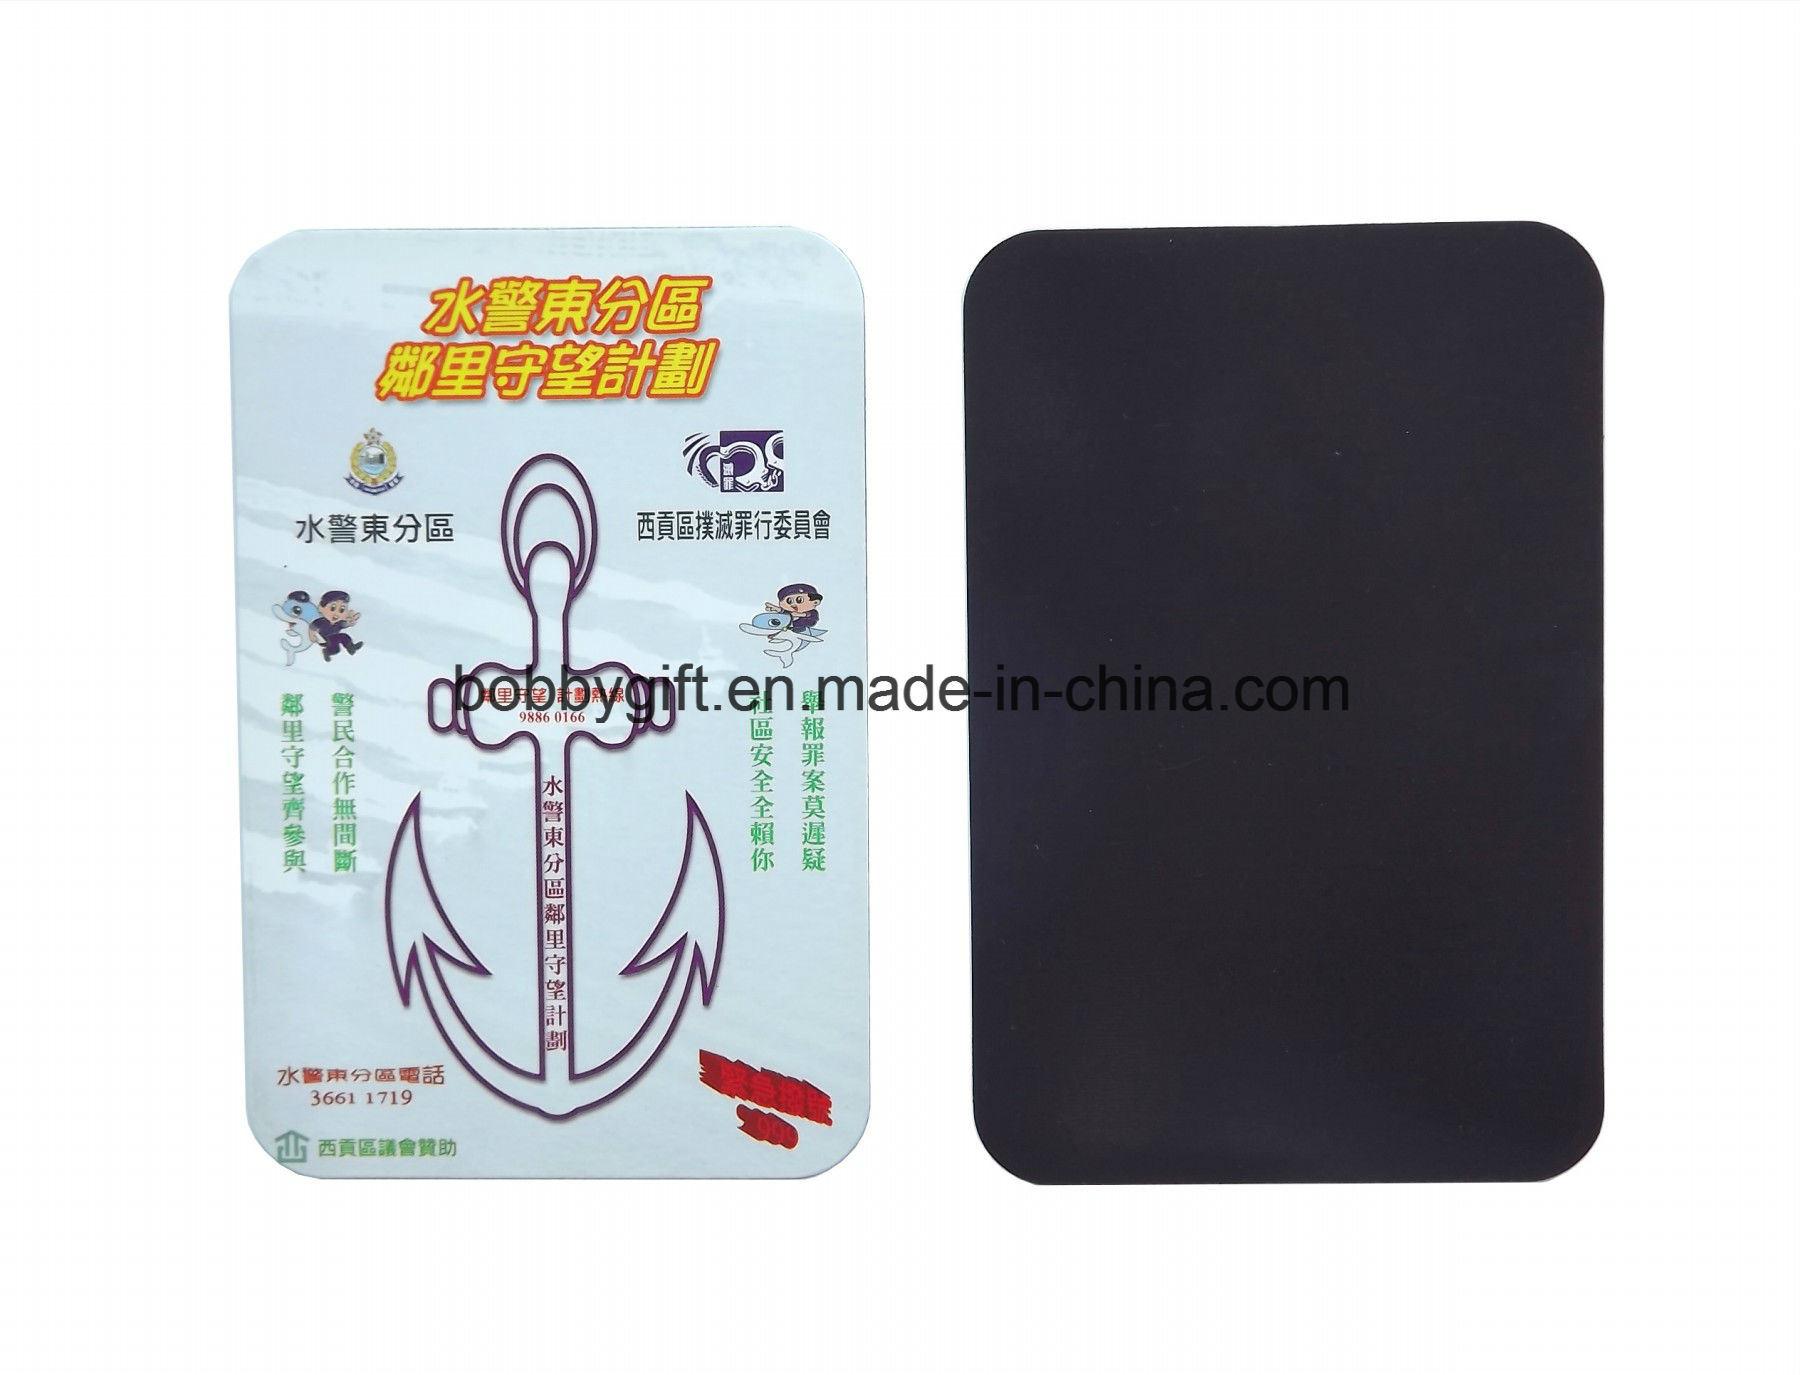 OEM Customized Fridge Magnet for Advertising Gifts